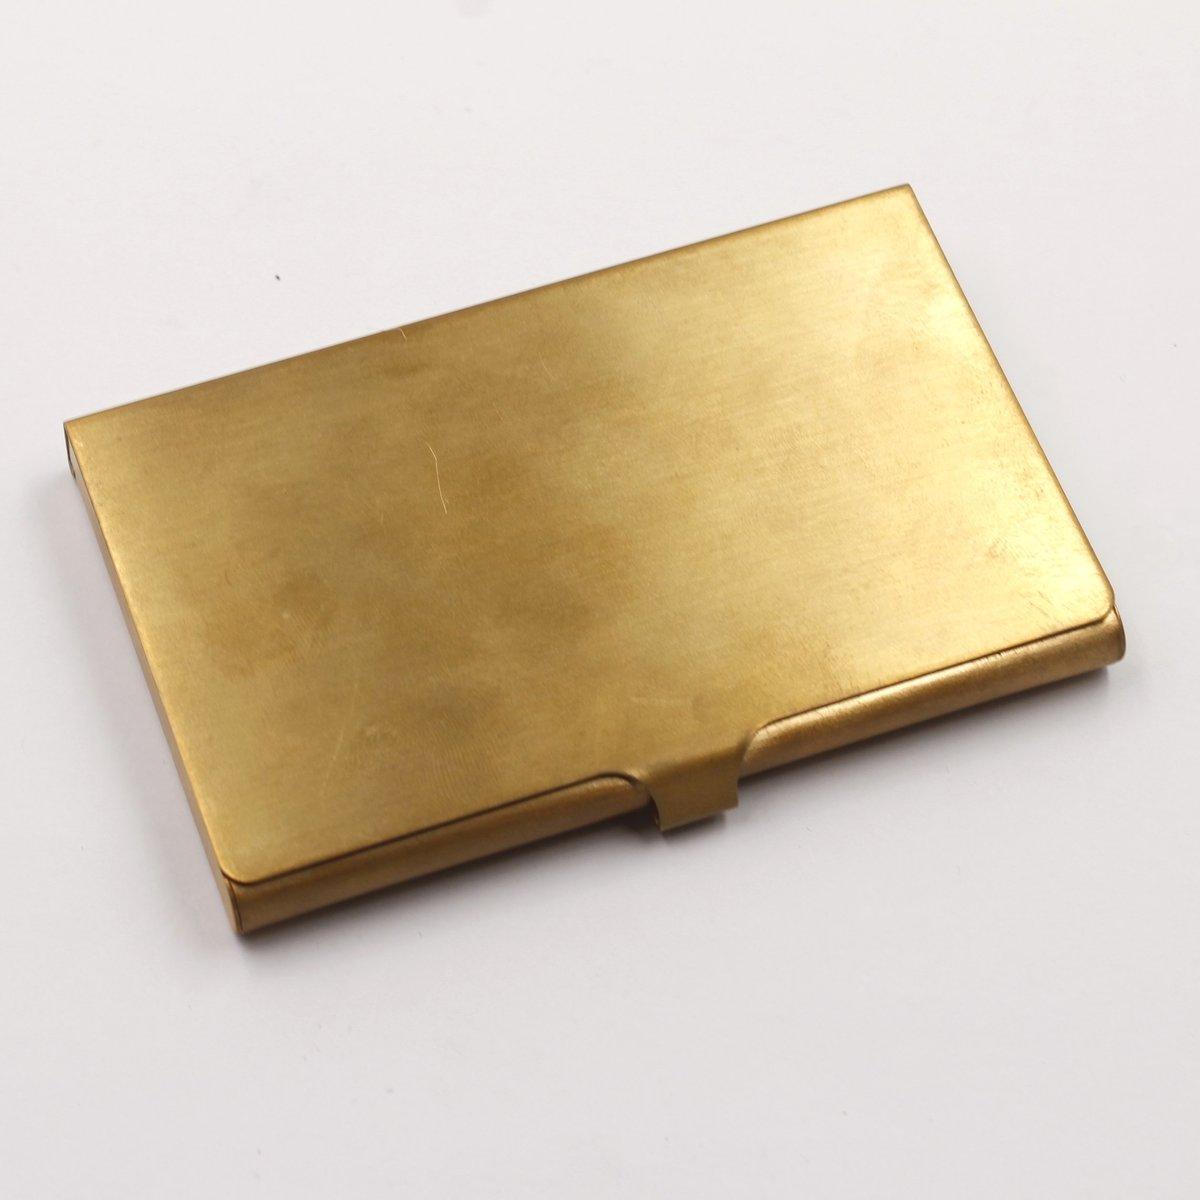 Copper Case